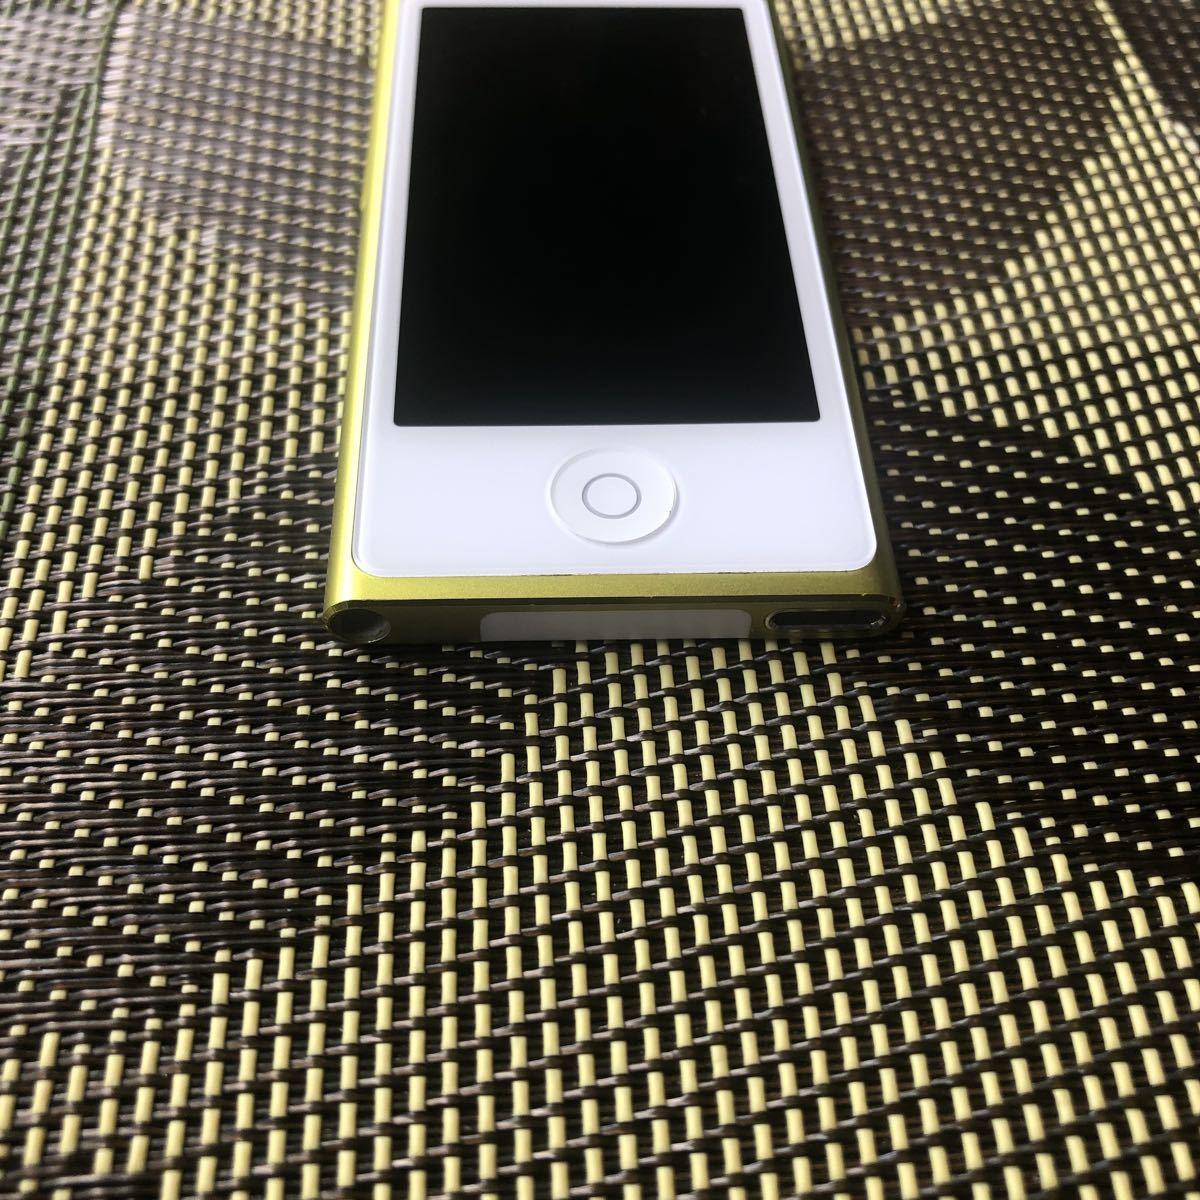 iPod7世代 16G yellow 中古 比較的美品 管理番号0317A_画像2